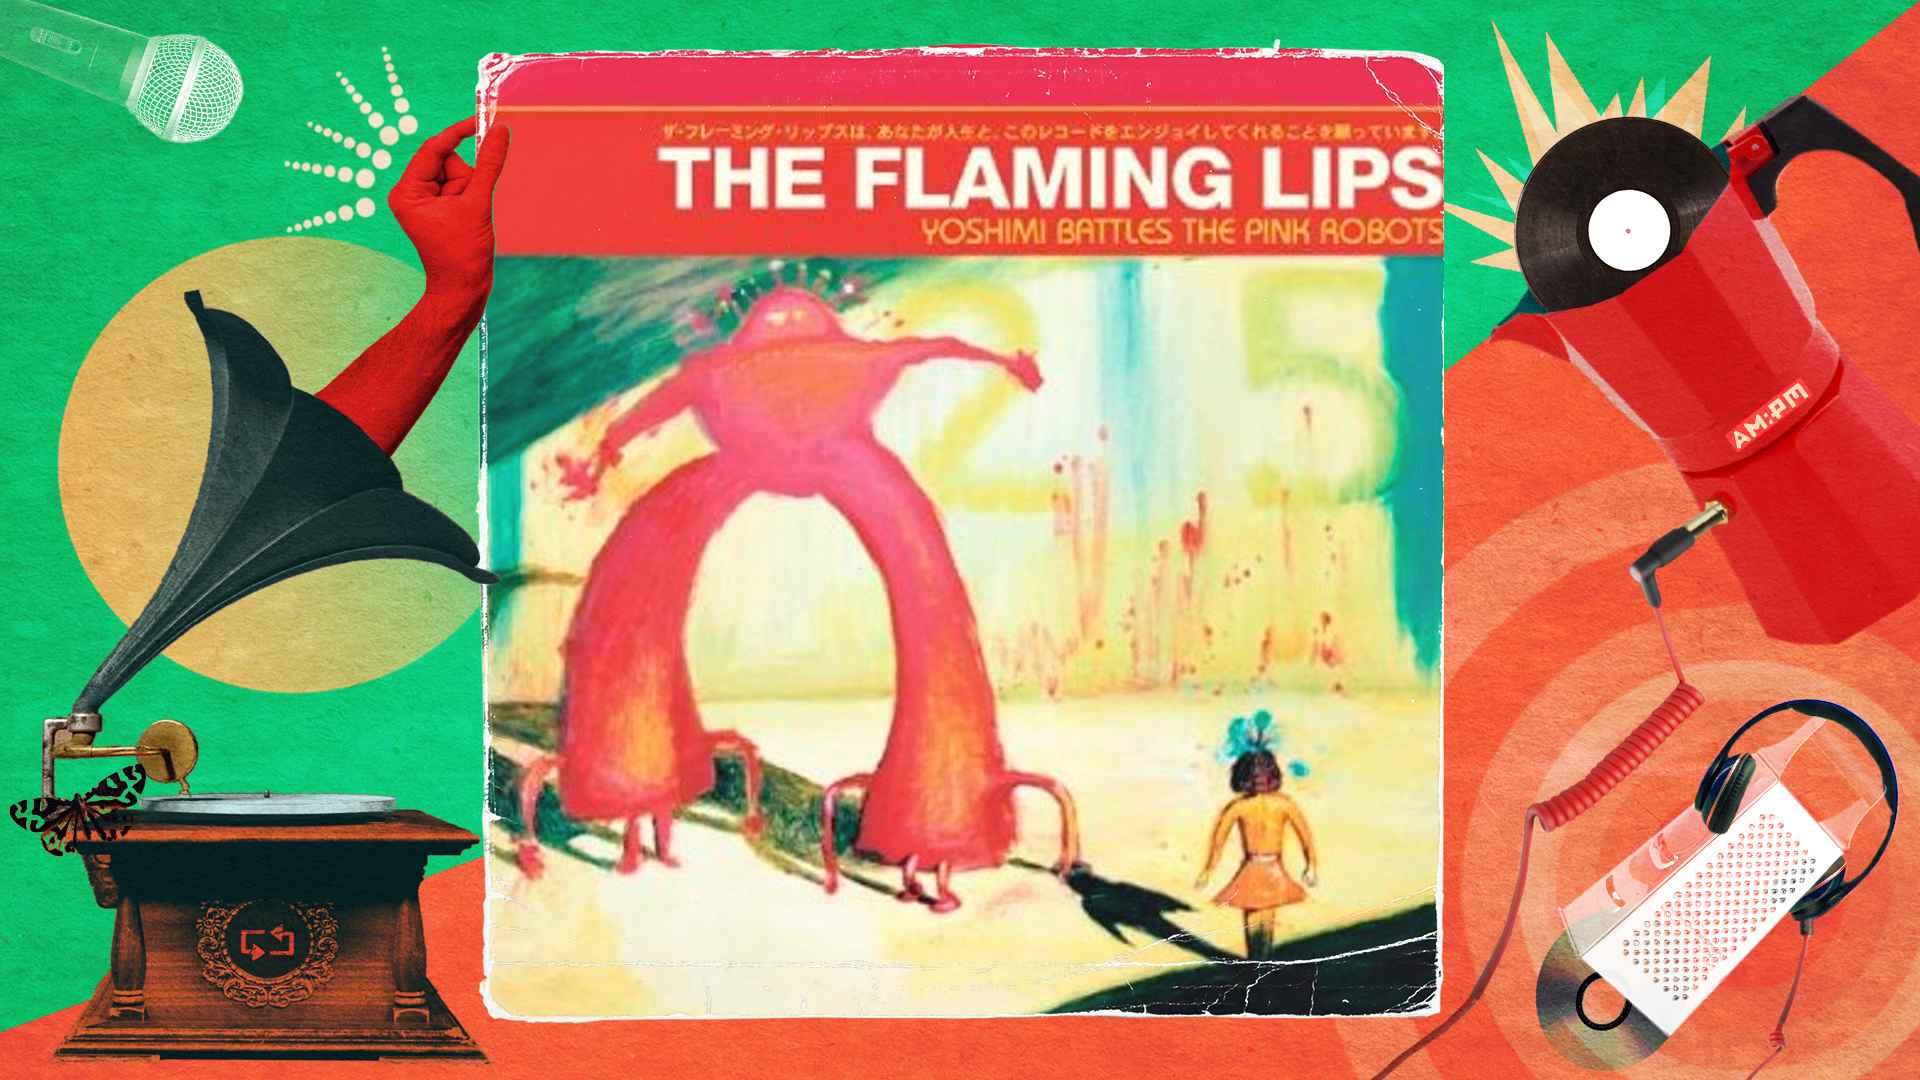 Diseño: Jennifer Ancizar, a partir de la portada del álbum Yoshimi Battles the Pink Robots.